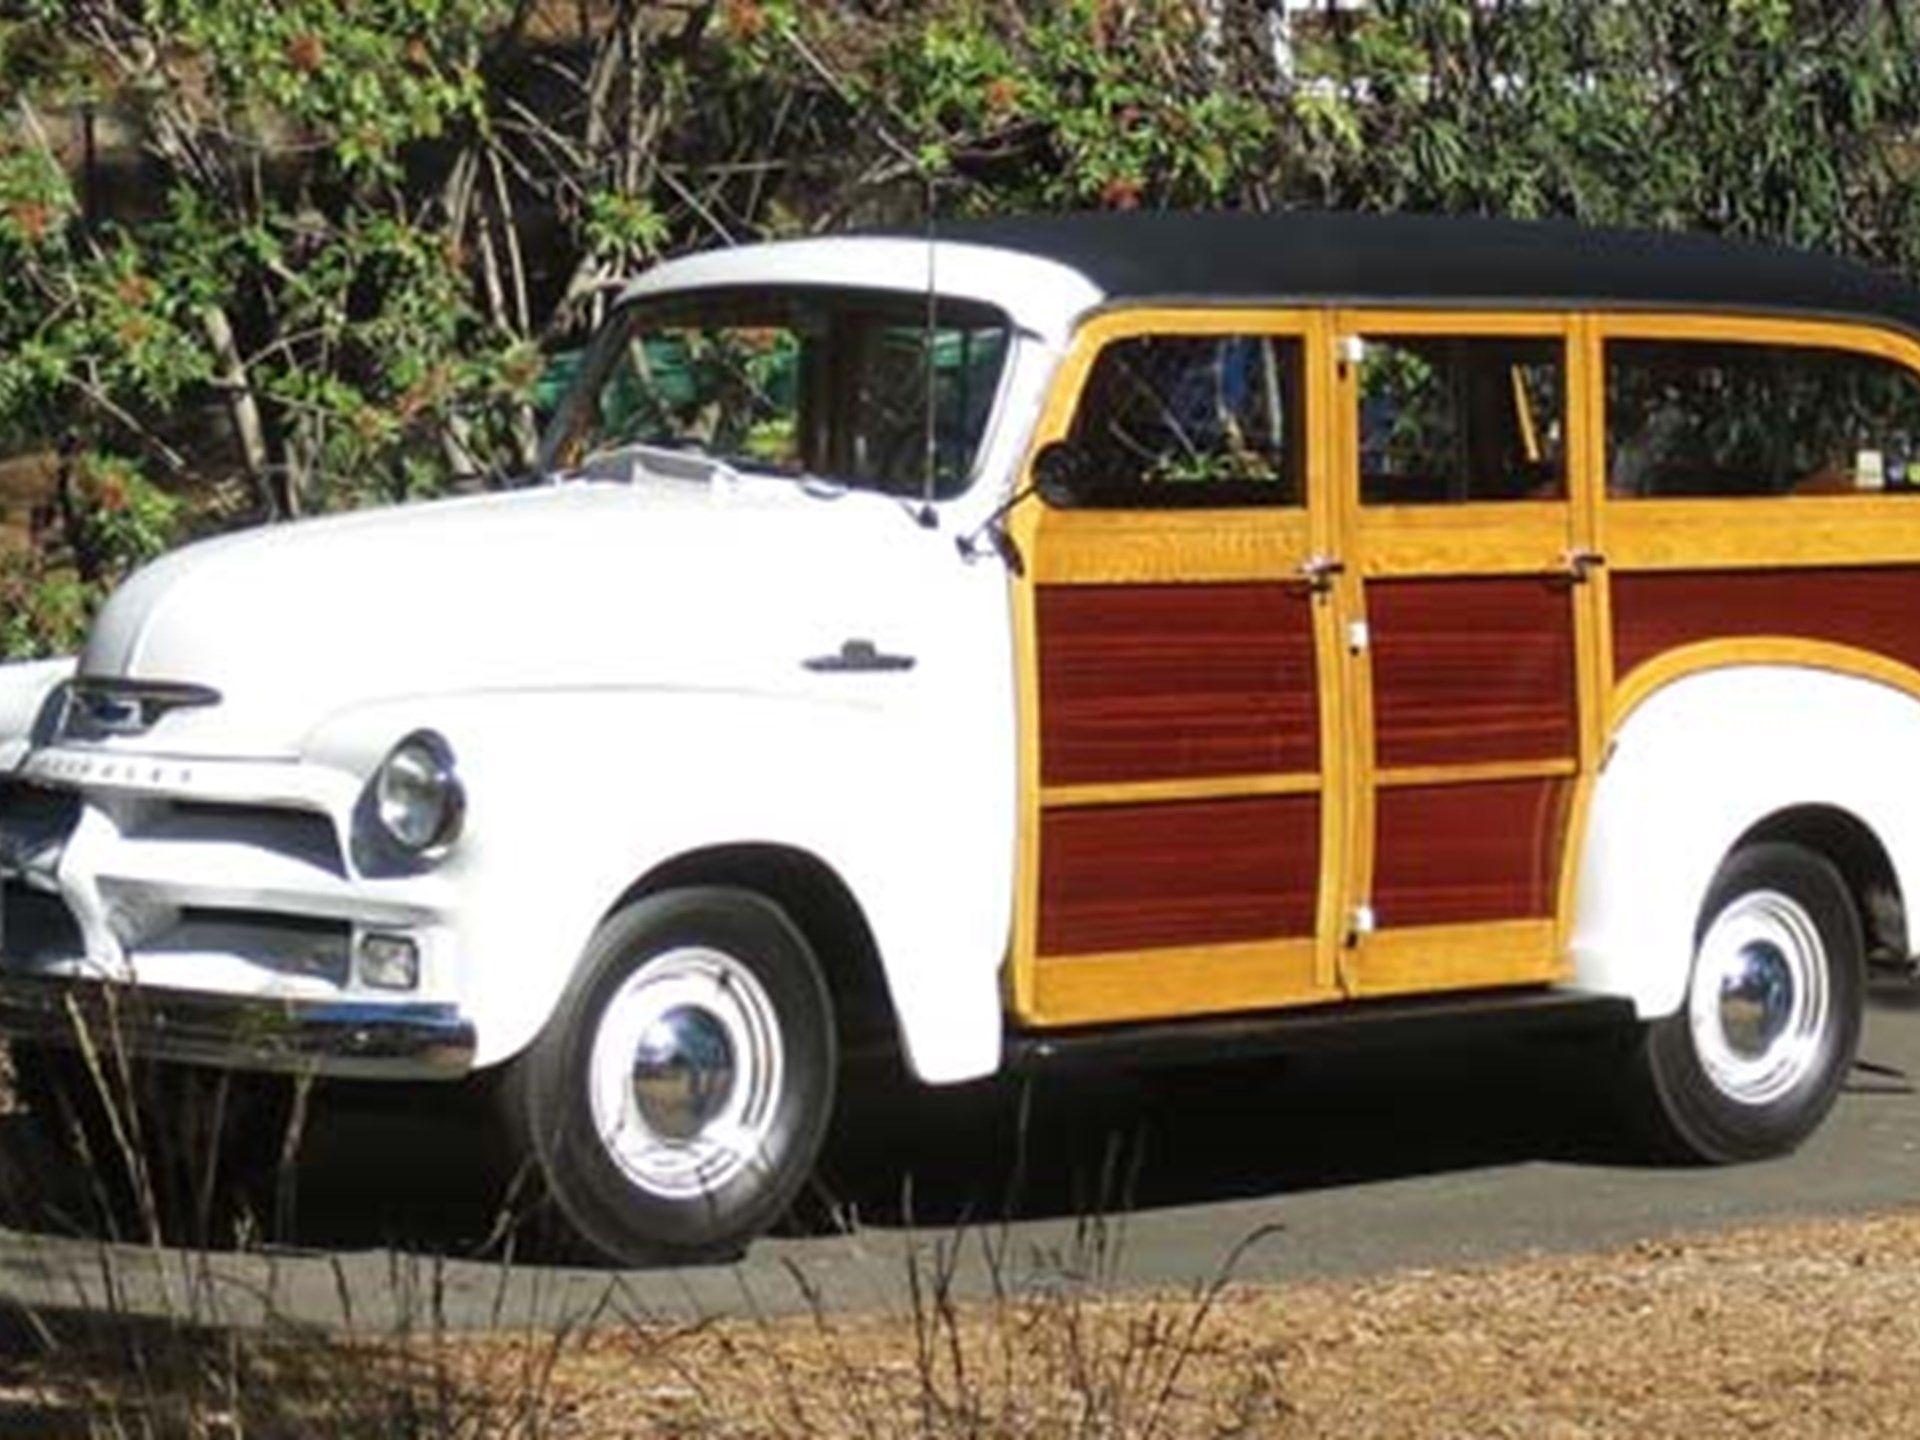 1955 Chevrolet Model 3112 Carryall Wagon -